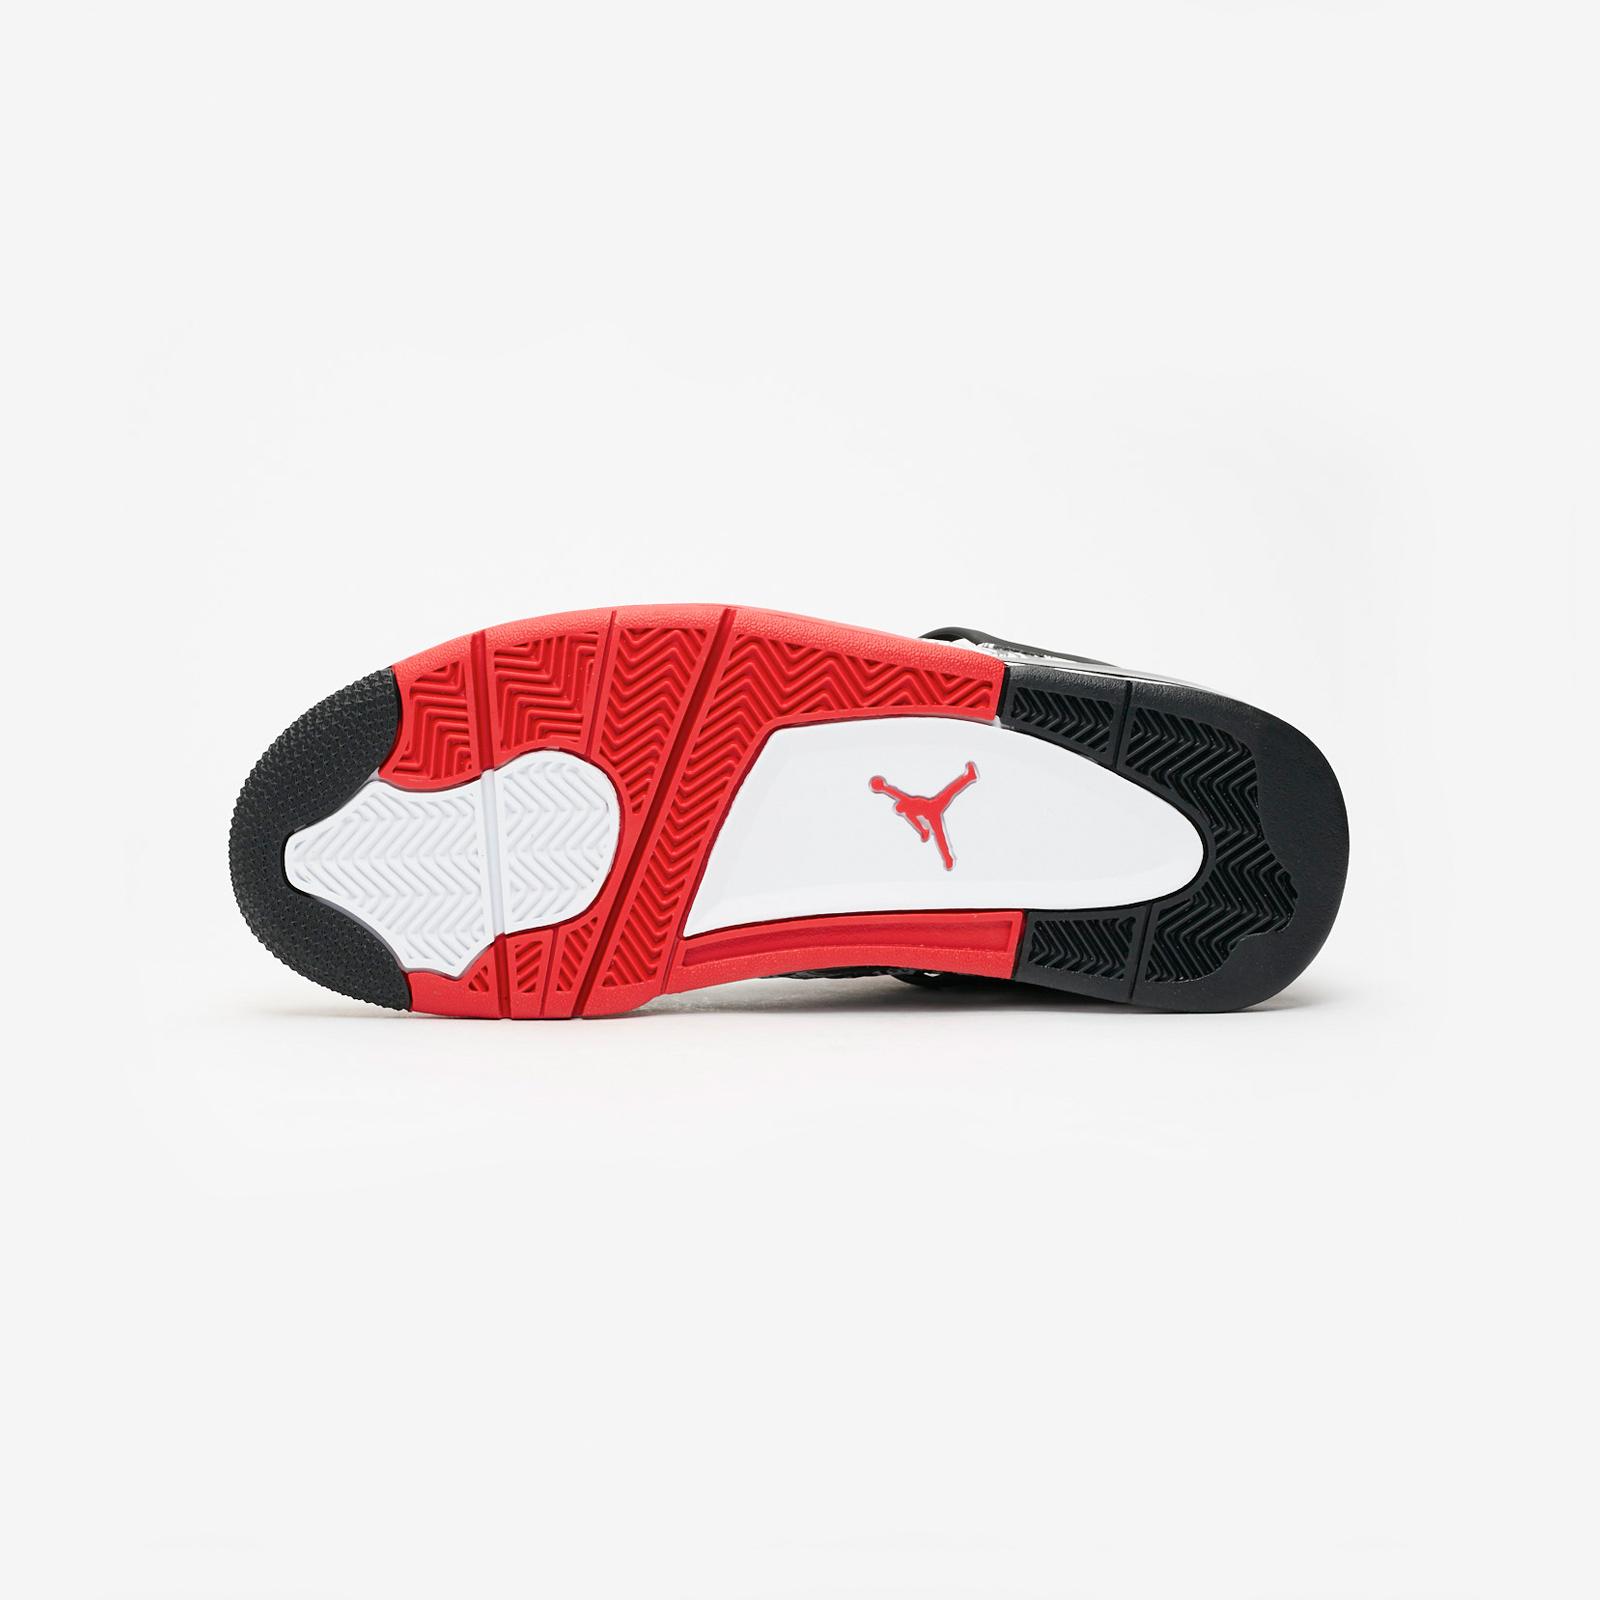 differently f598e d96ed Jordan Brand Air Jordan 4 Tattoo - Bq0897-006 - Sneakersnstuff   sneakers    streetwear online since 1999